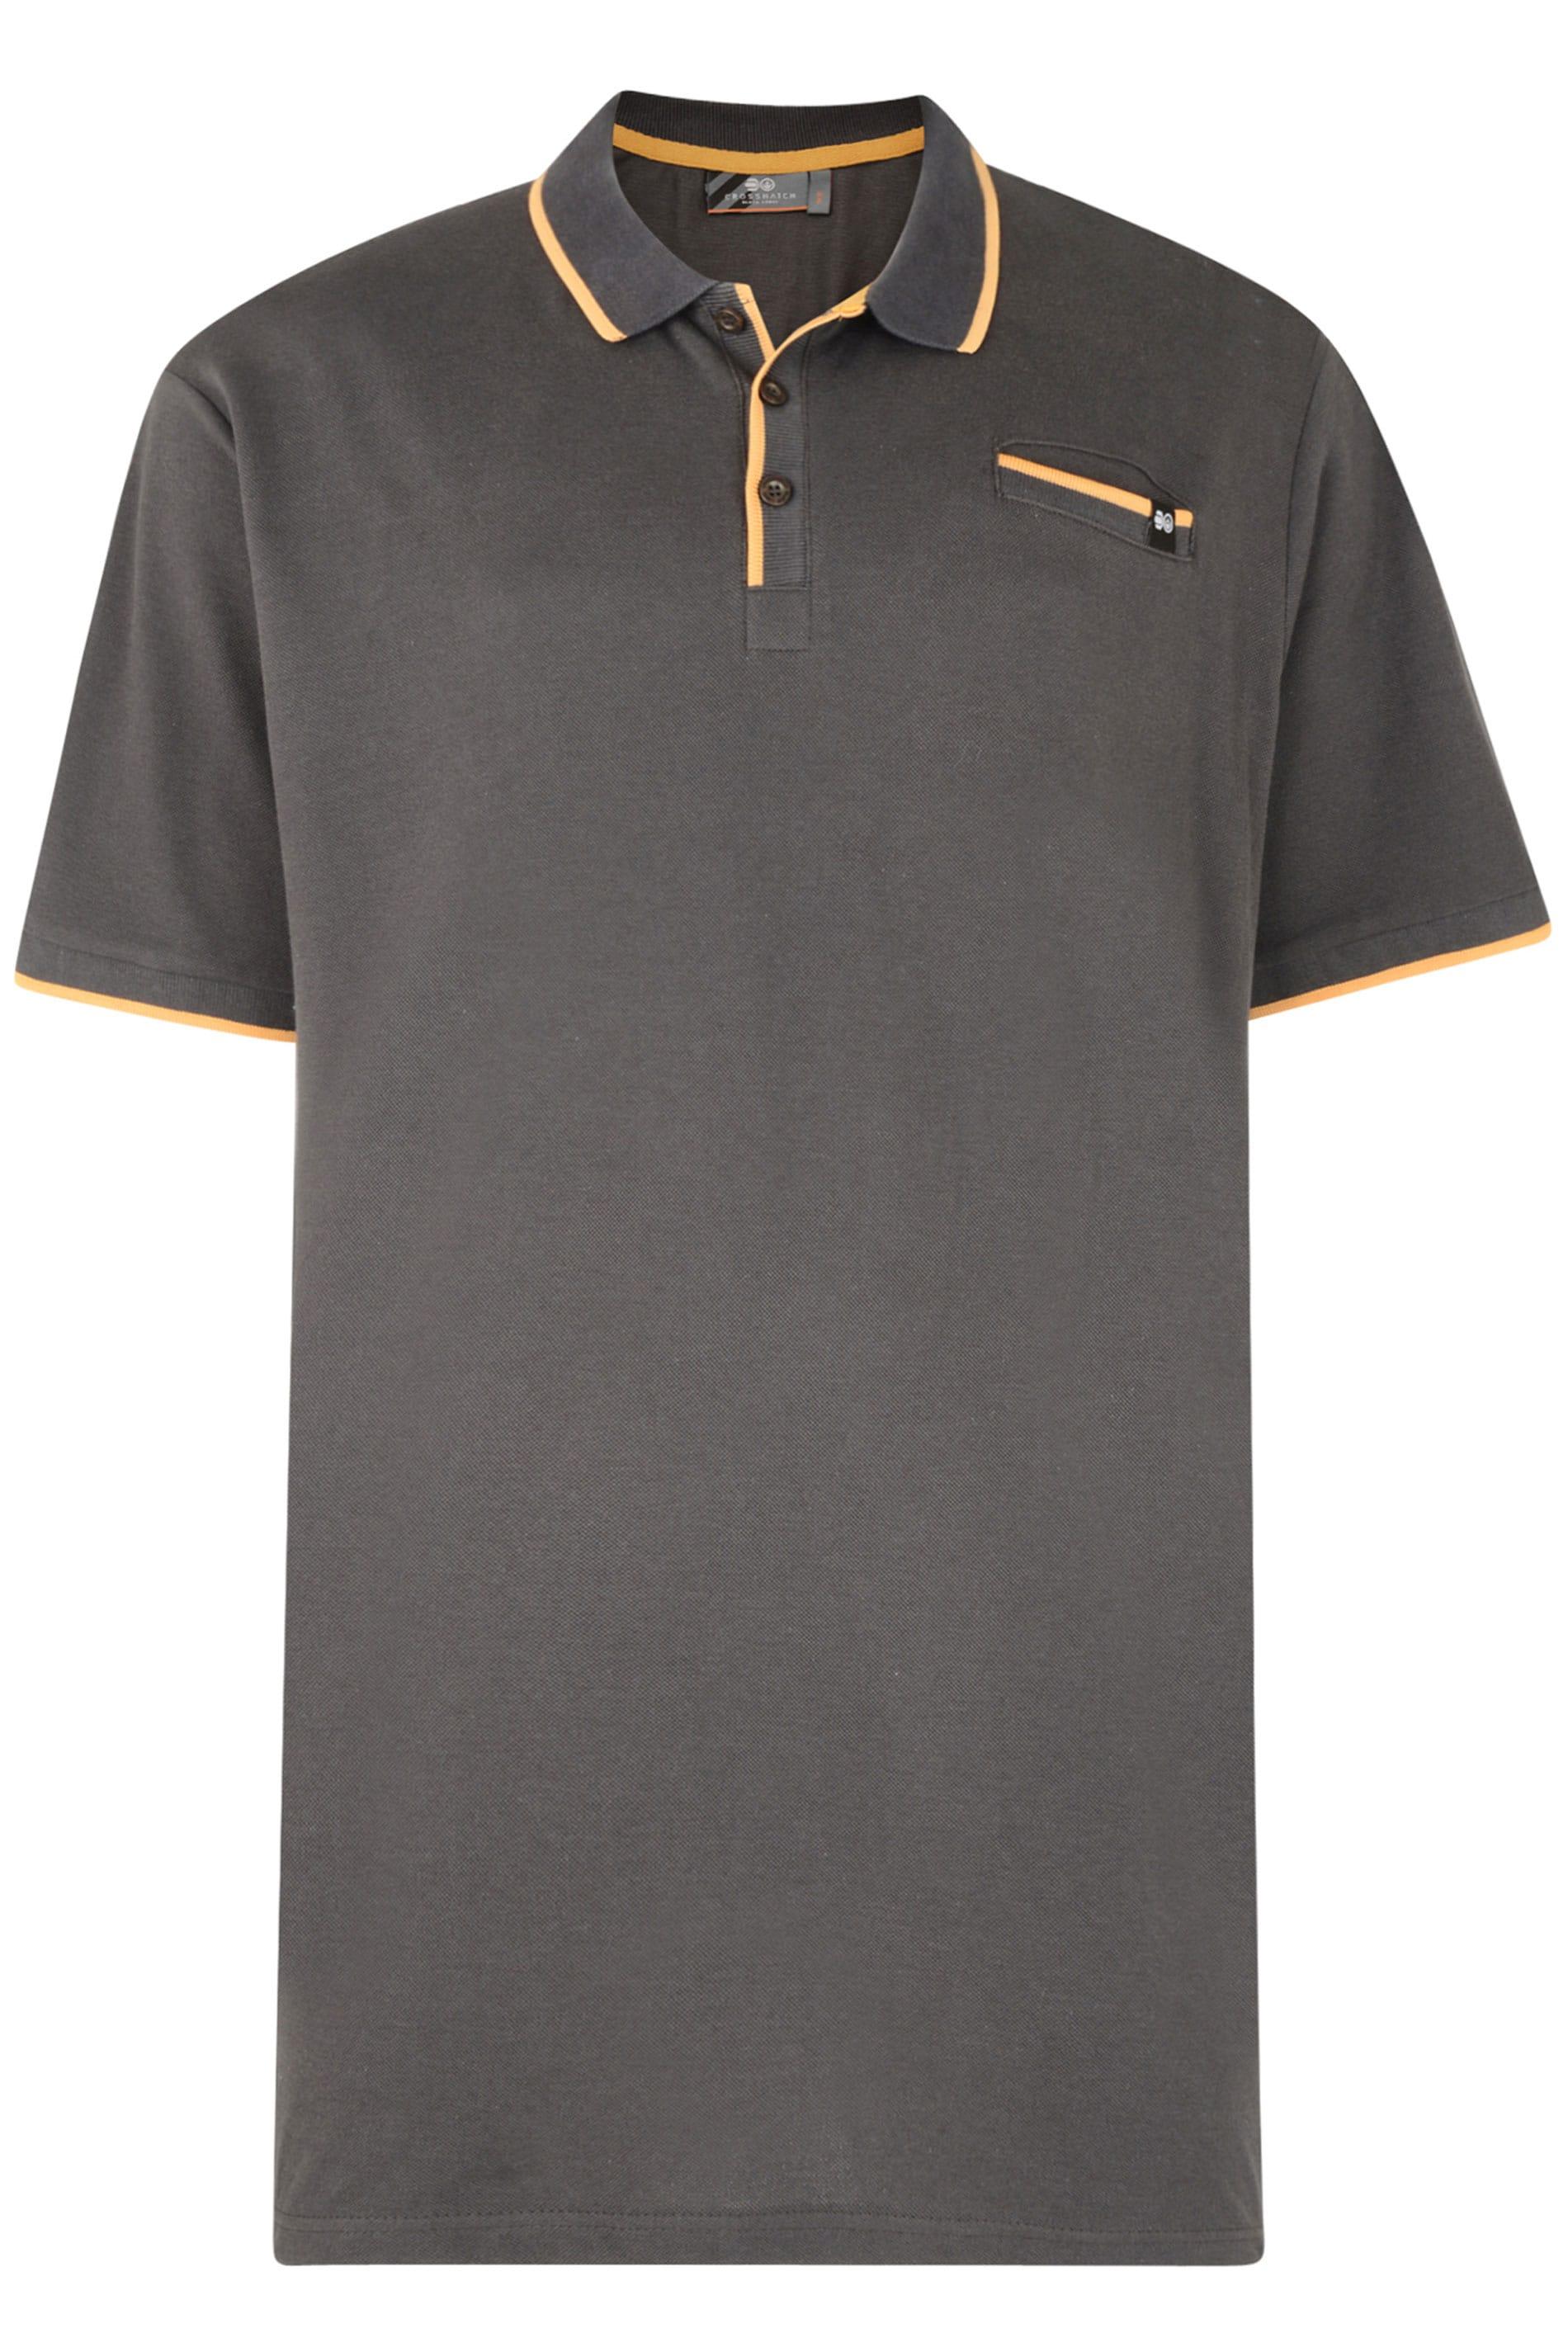 CROSSHATCH Black & Yellow Tipped Polo Shirt